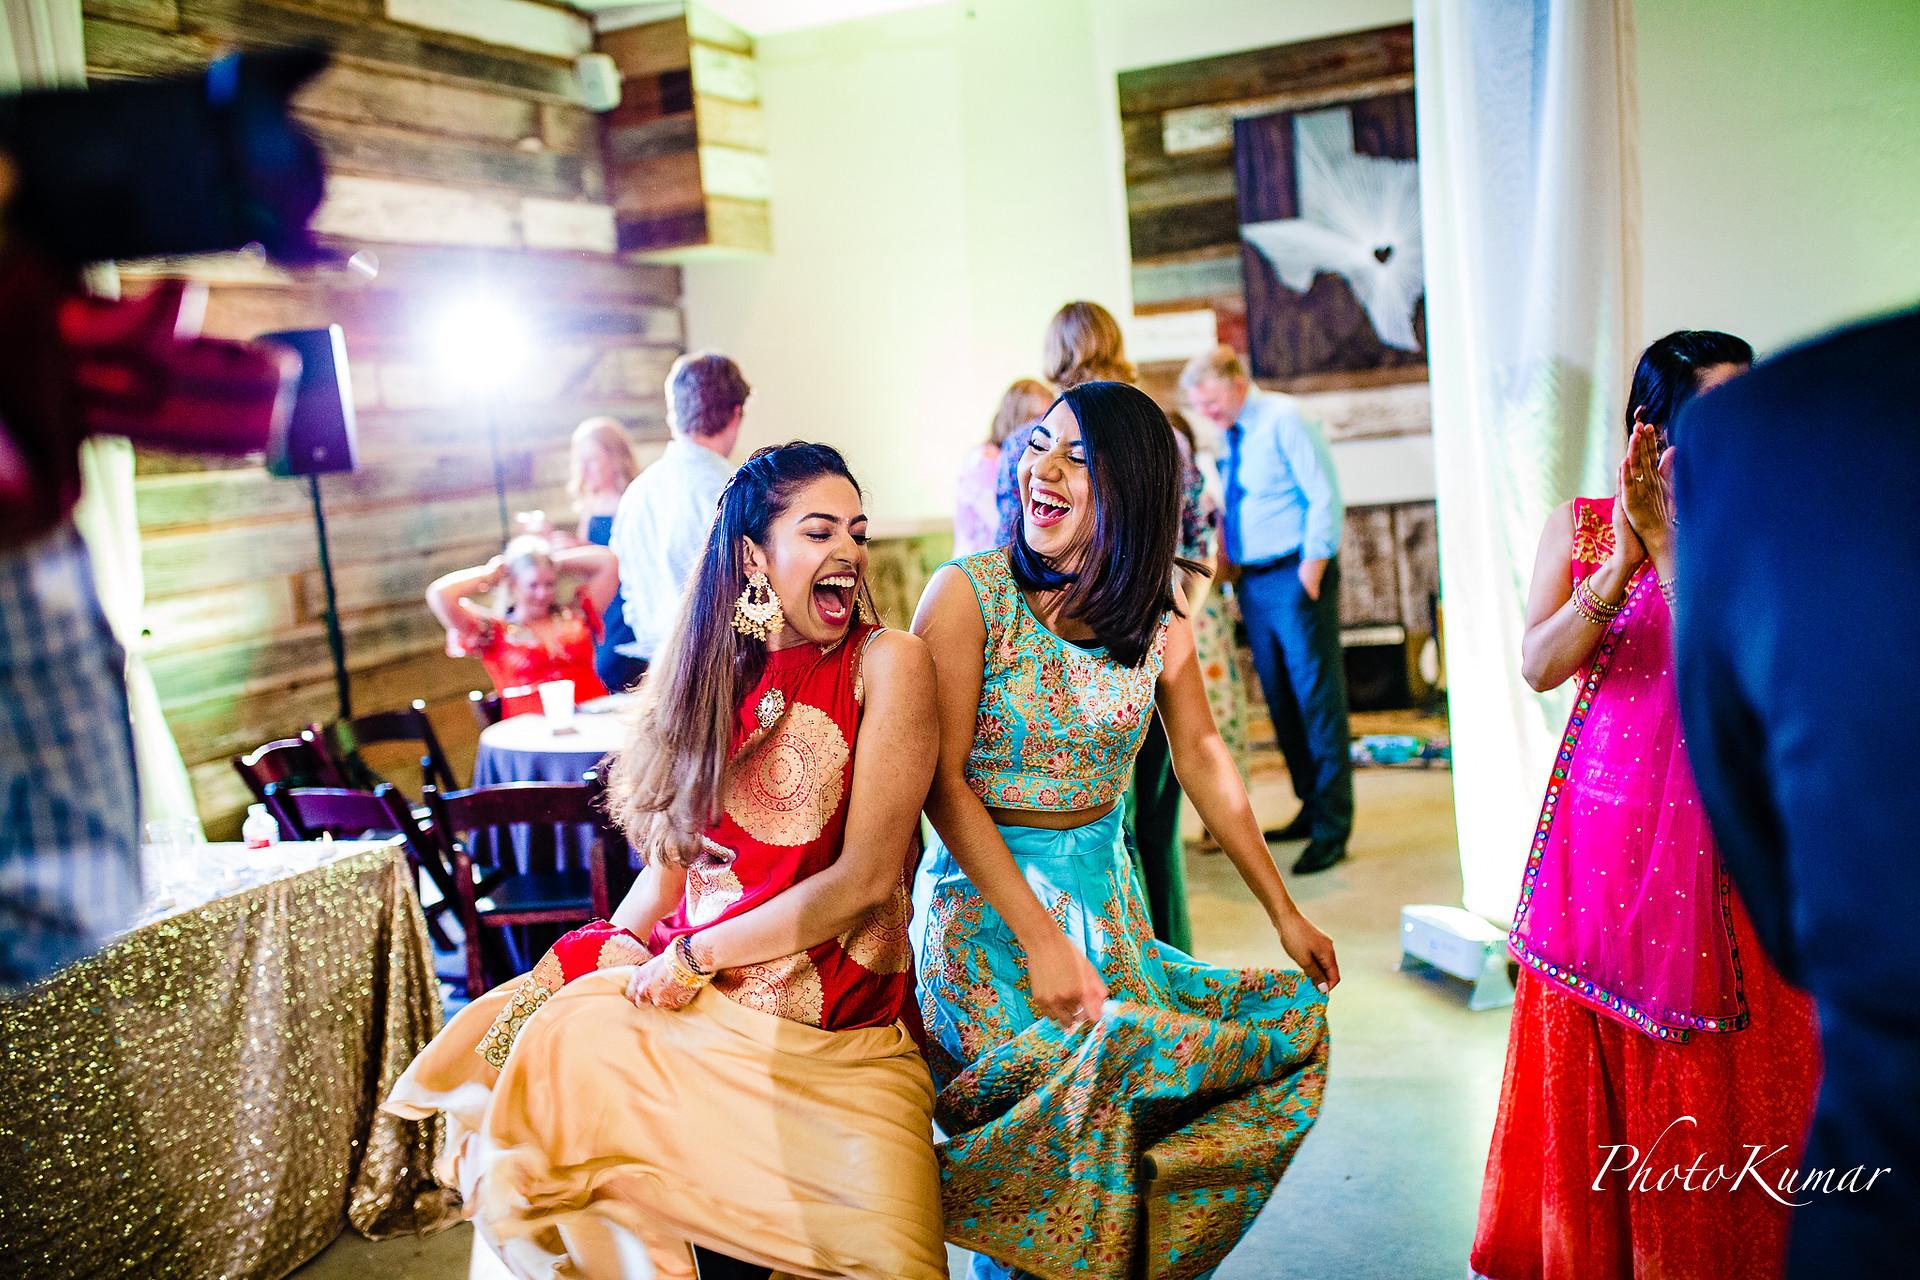 PhotoKumar-Jackie and Sid-Sangeeth (1 of